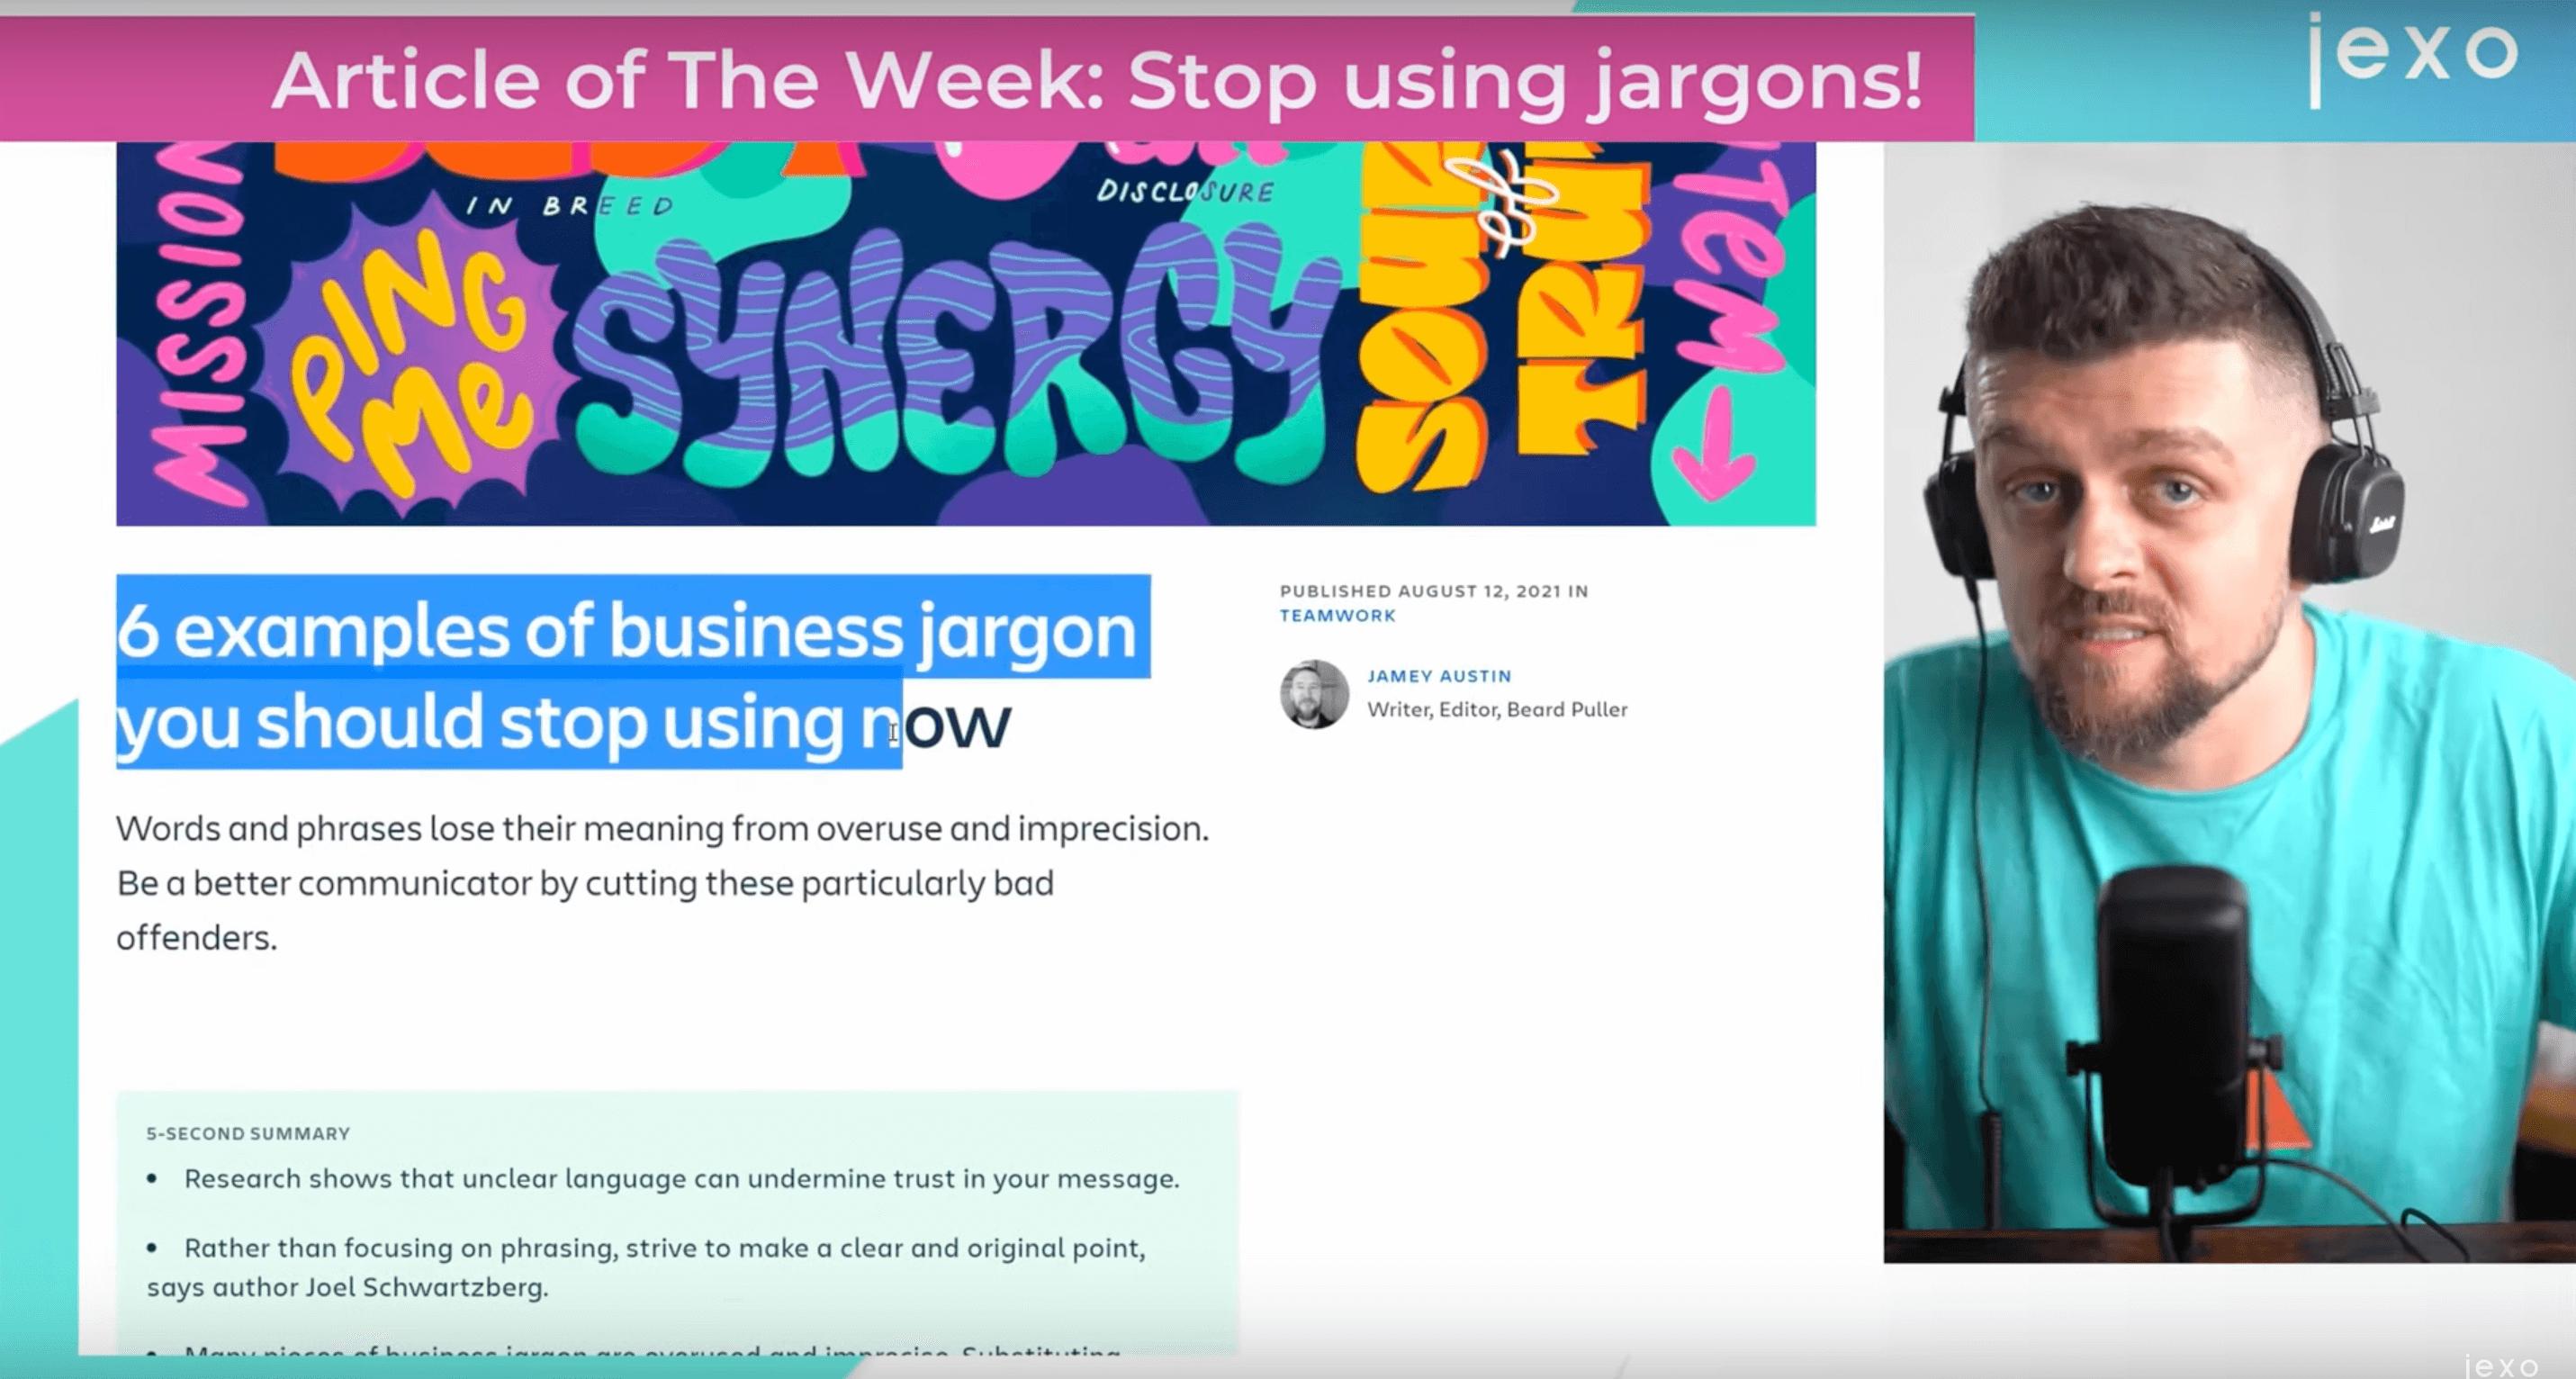 Atlassian News: Stop using business jargon!